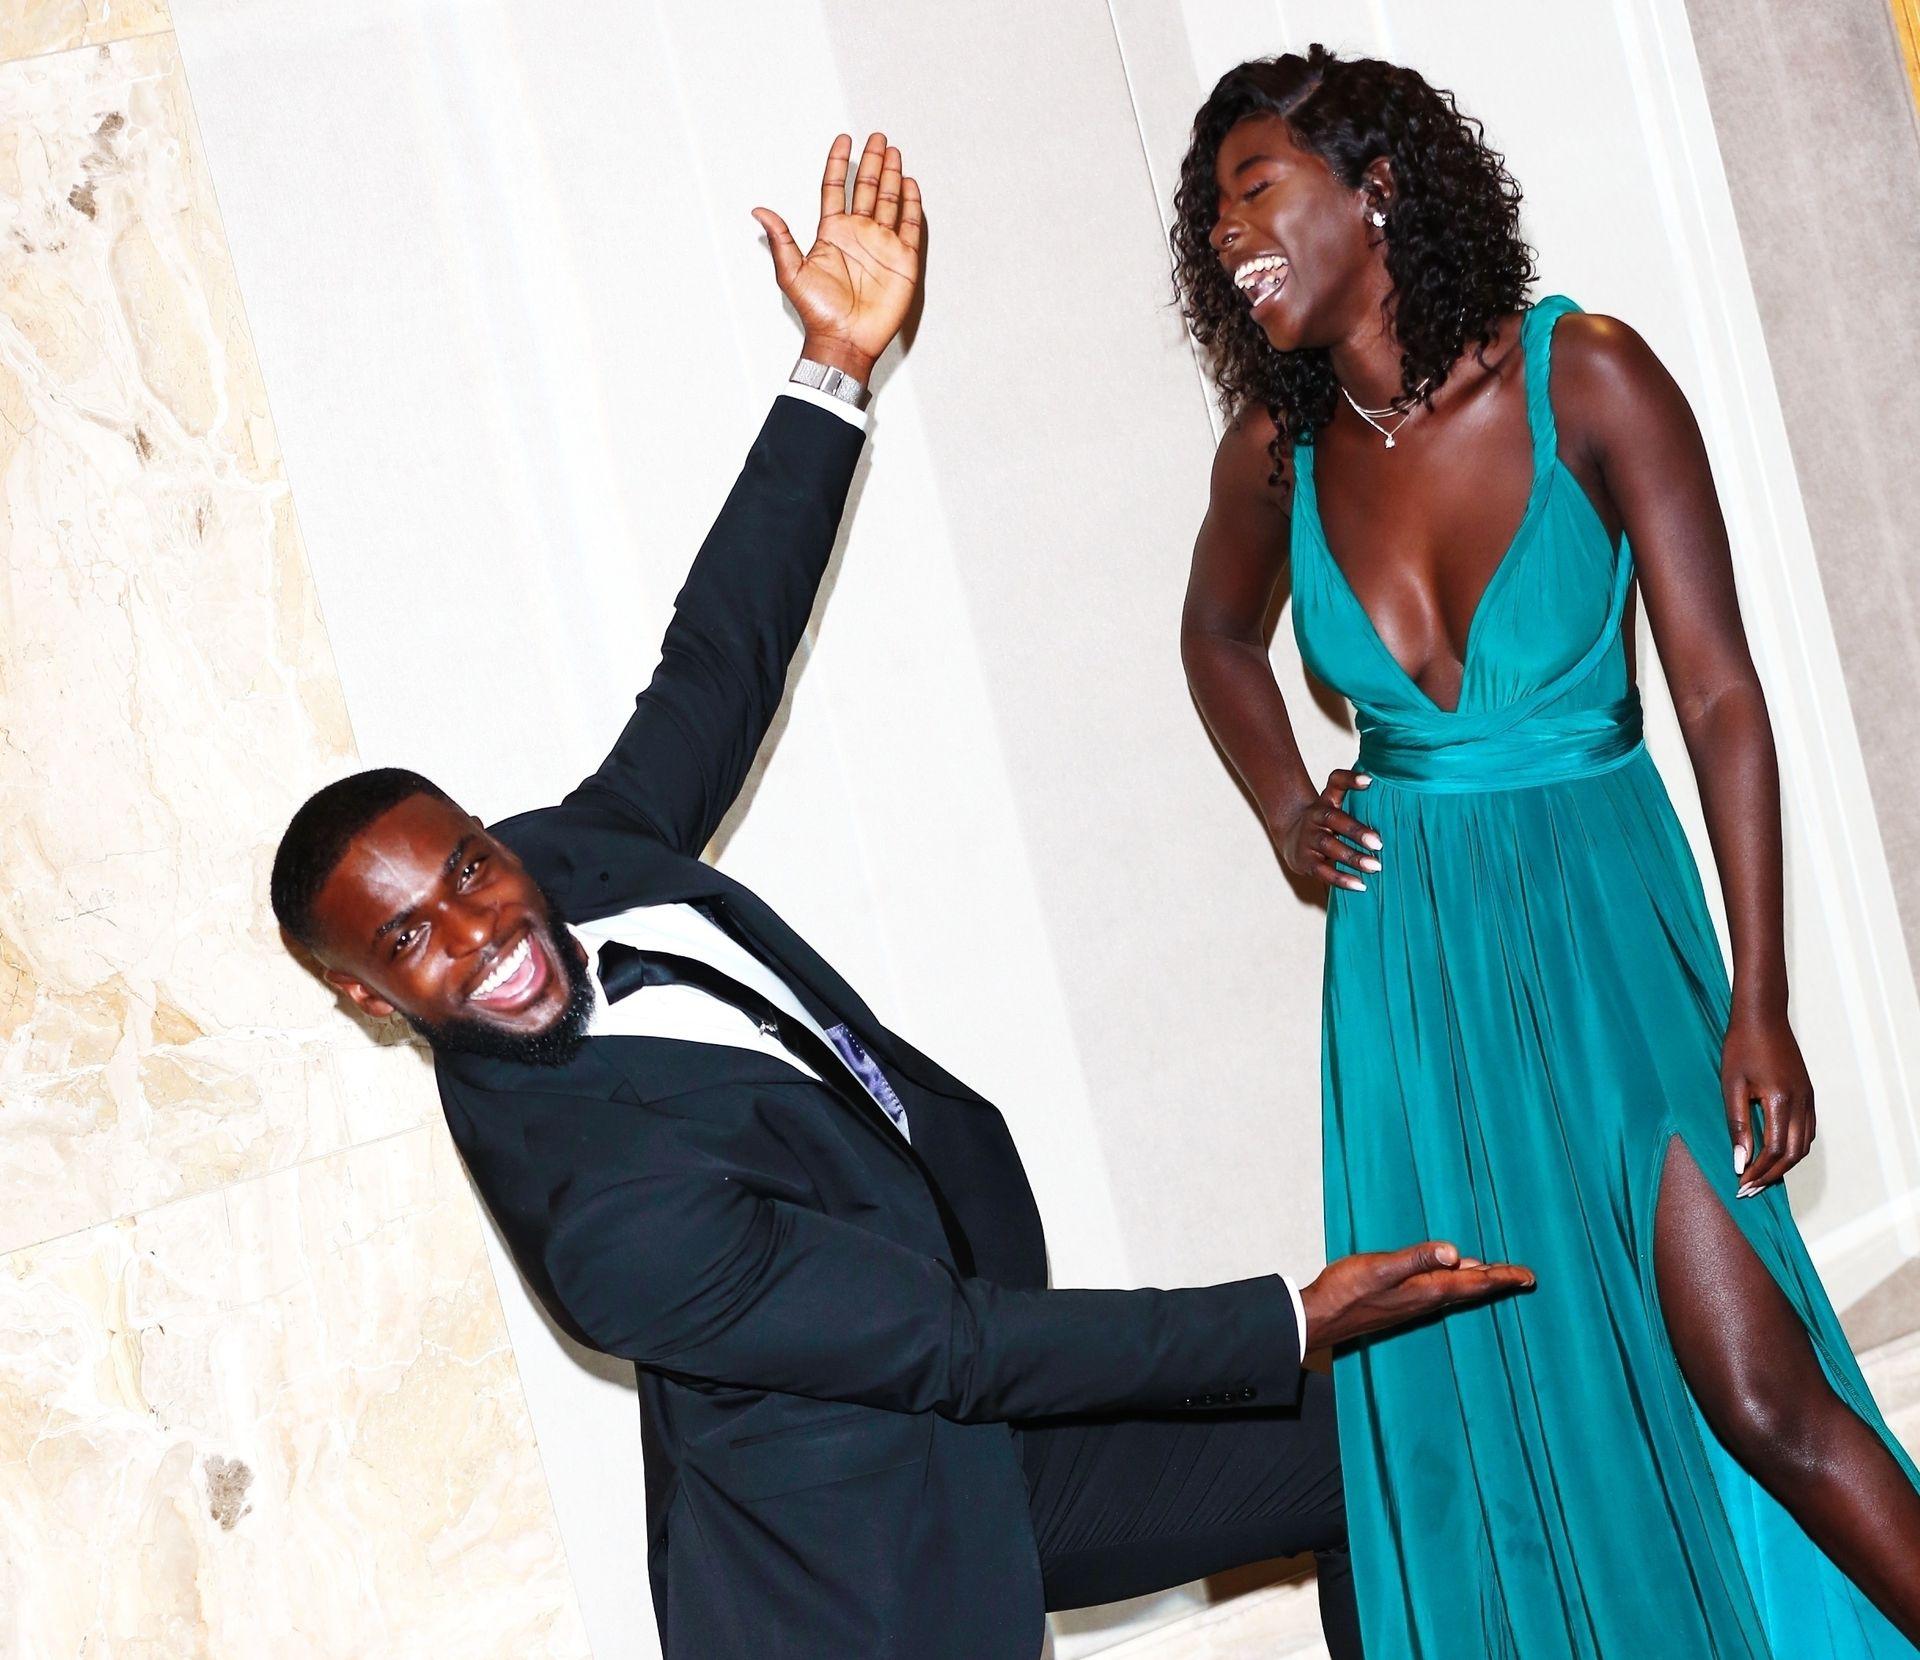 Mike Boateng & Priscilla Anyabu Are Seen At British Ethnic Diversity Sports Awards 0122